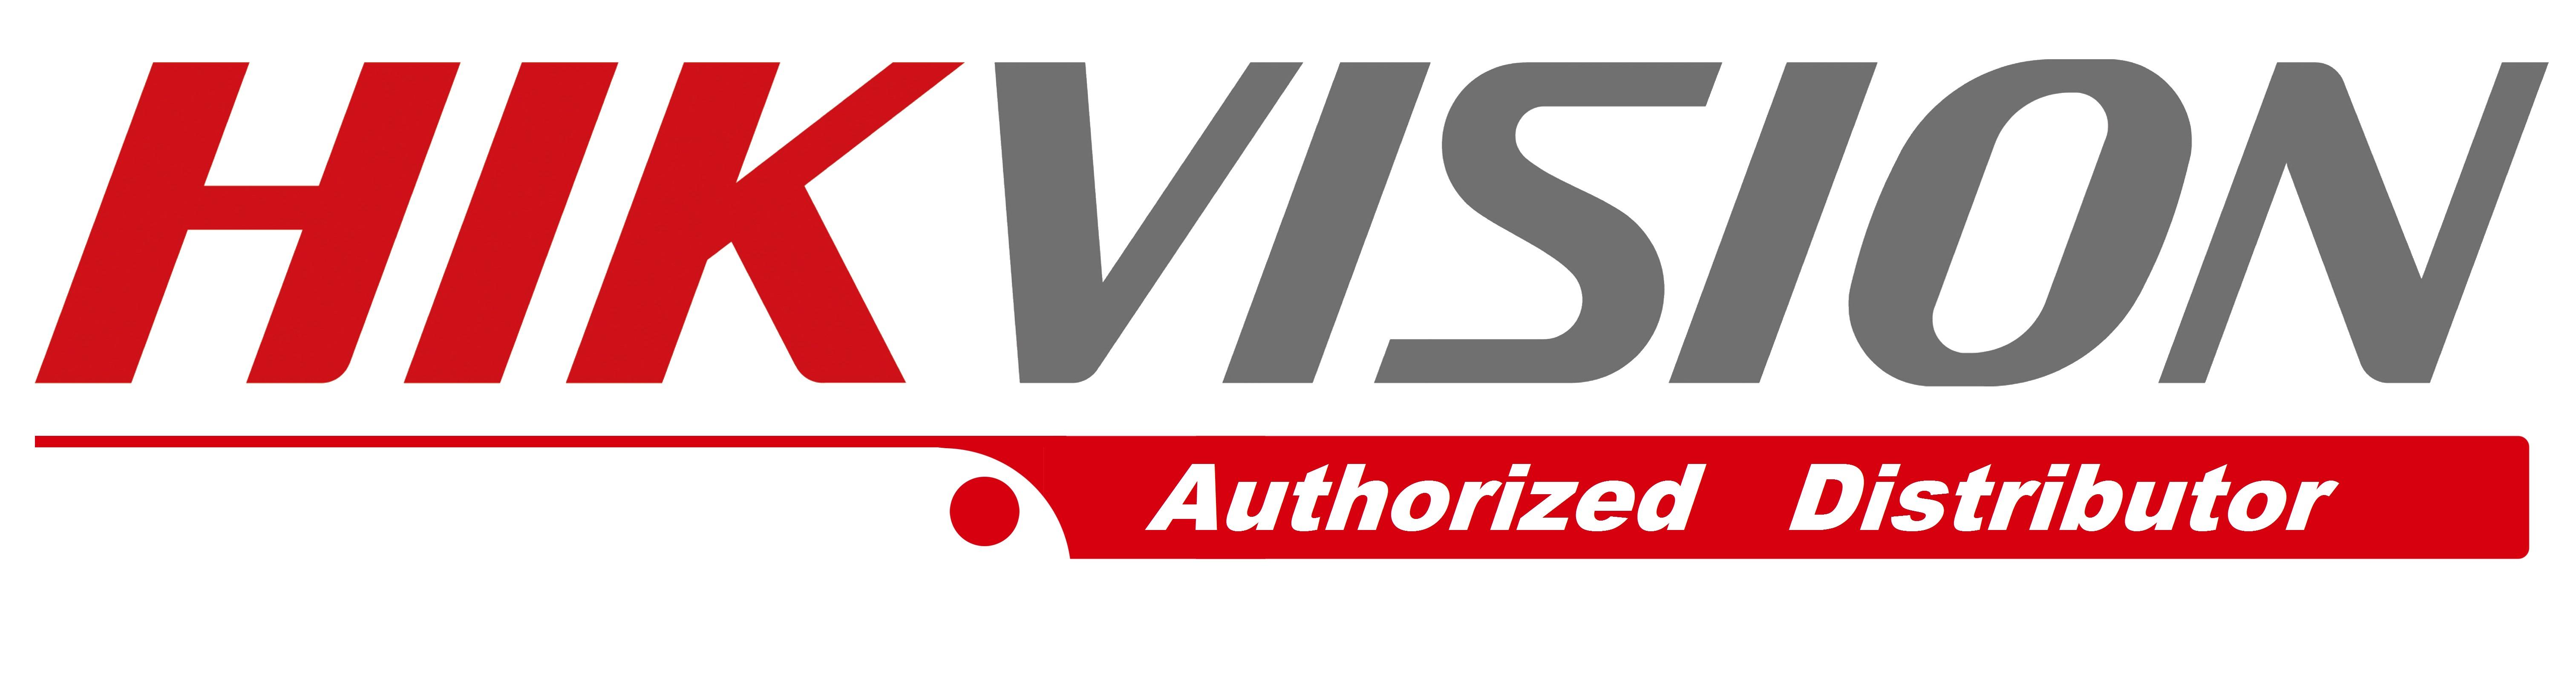 hikvision_logo_authorised_distributor_20130